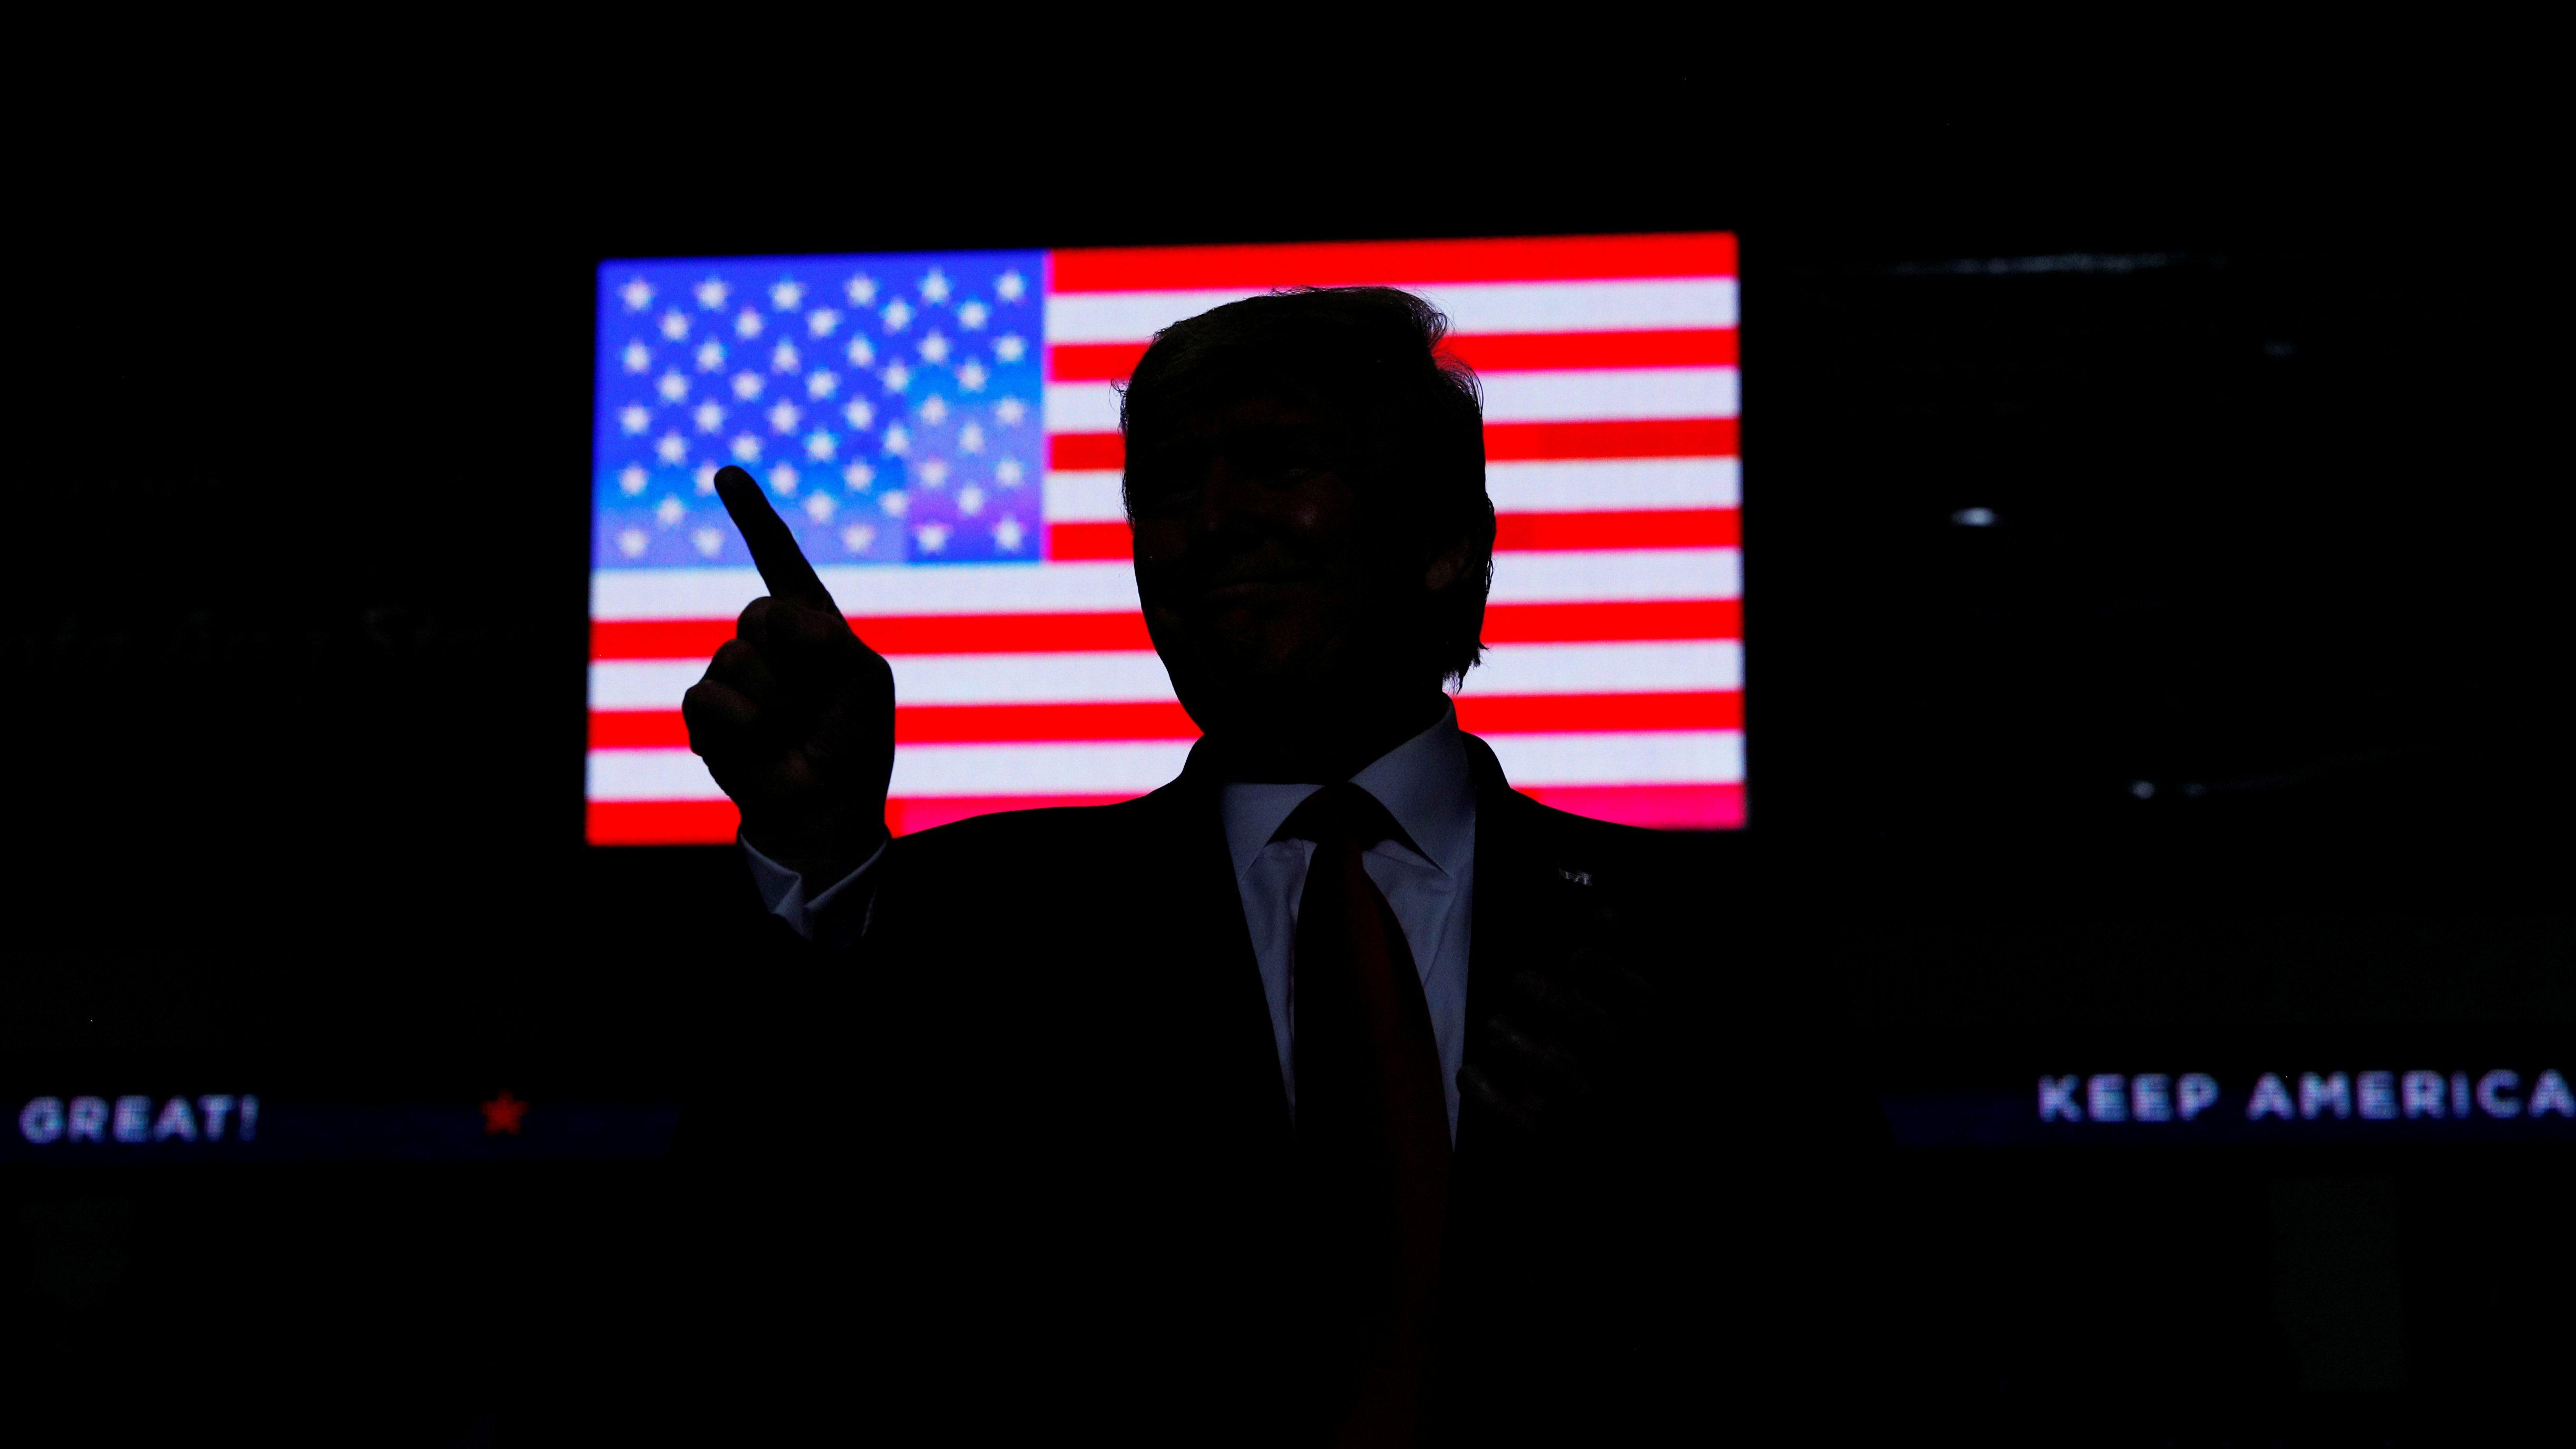 US President Donald Trump hosts a Keep America Great rally at the Santa Ana Star Center in Rio Rancho, New Mexico